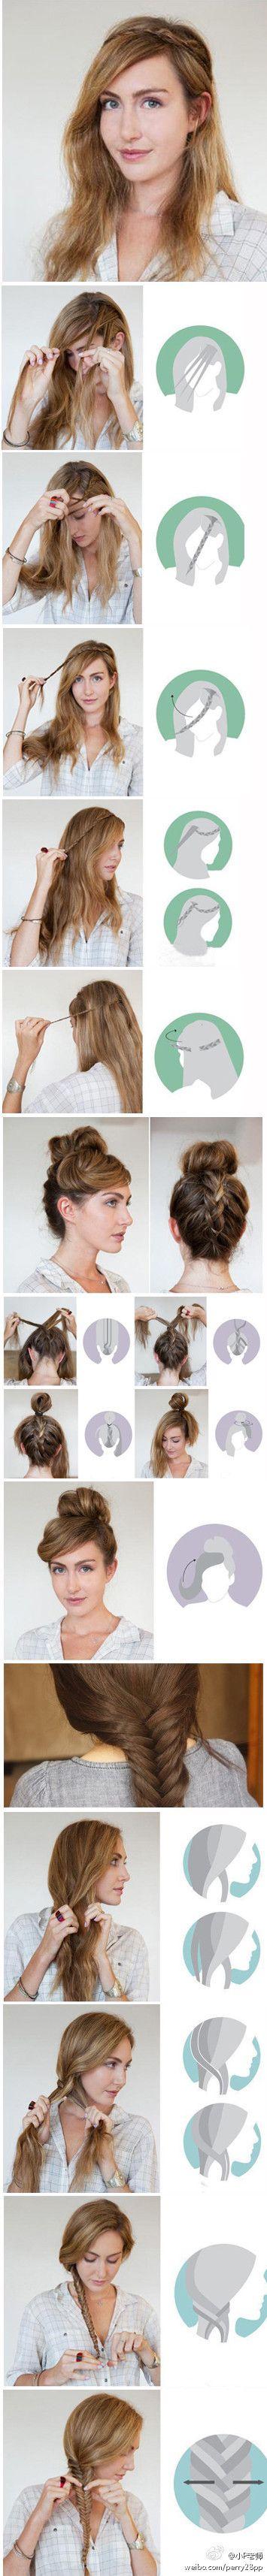 DIY Braided Hair Hairstyles